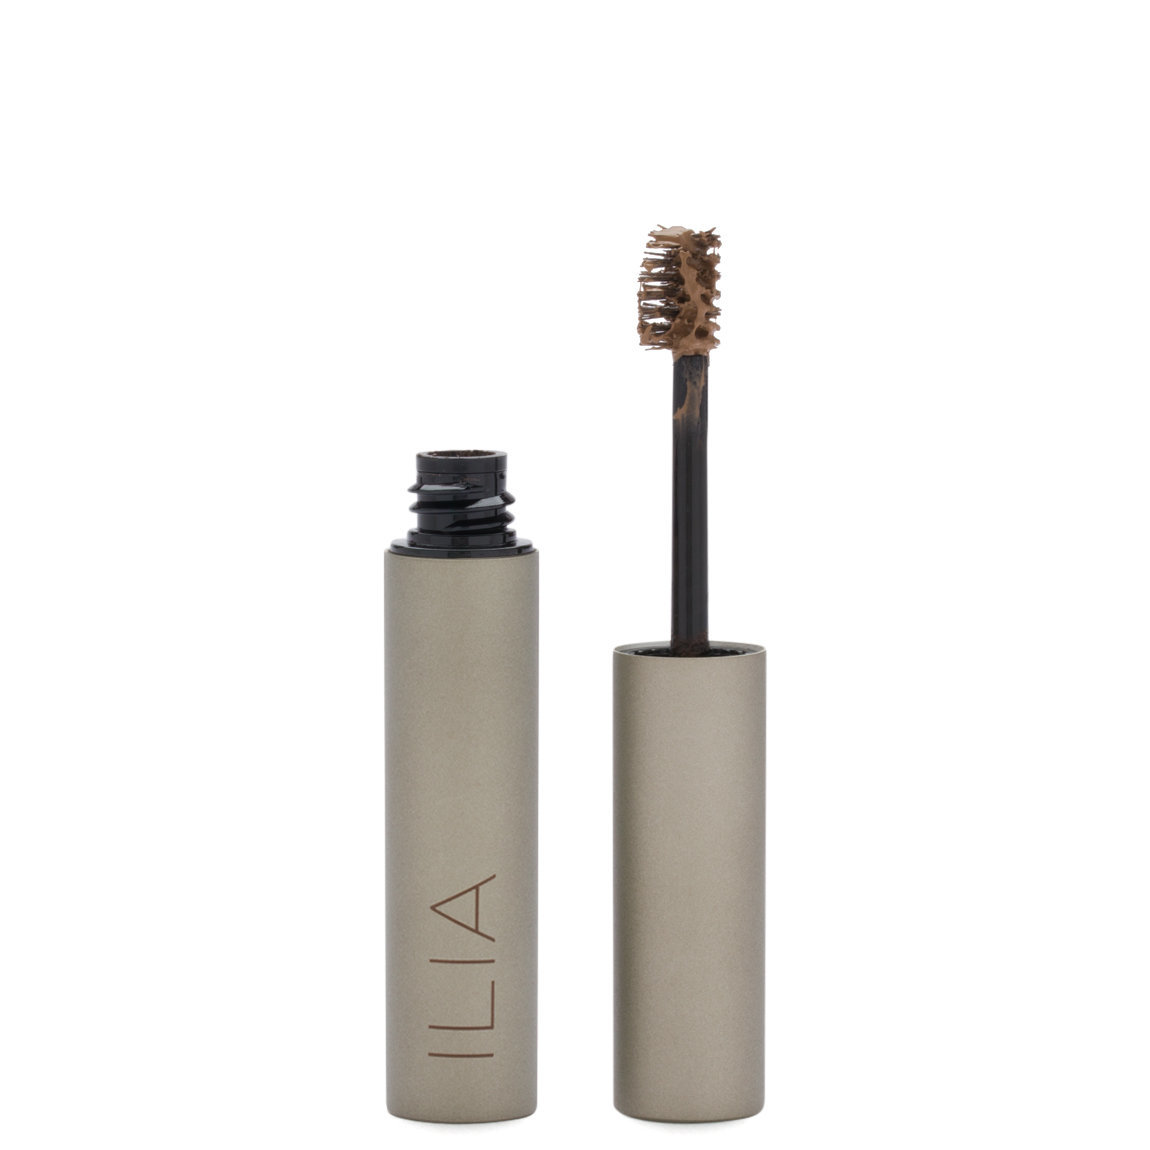 ILIA Essential Brow Natural Volumizing Brow Gel Blonde